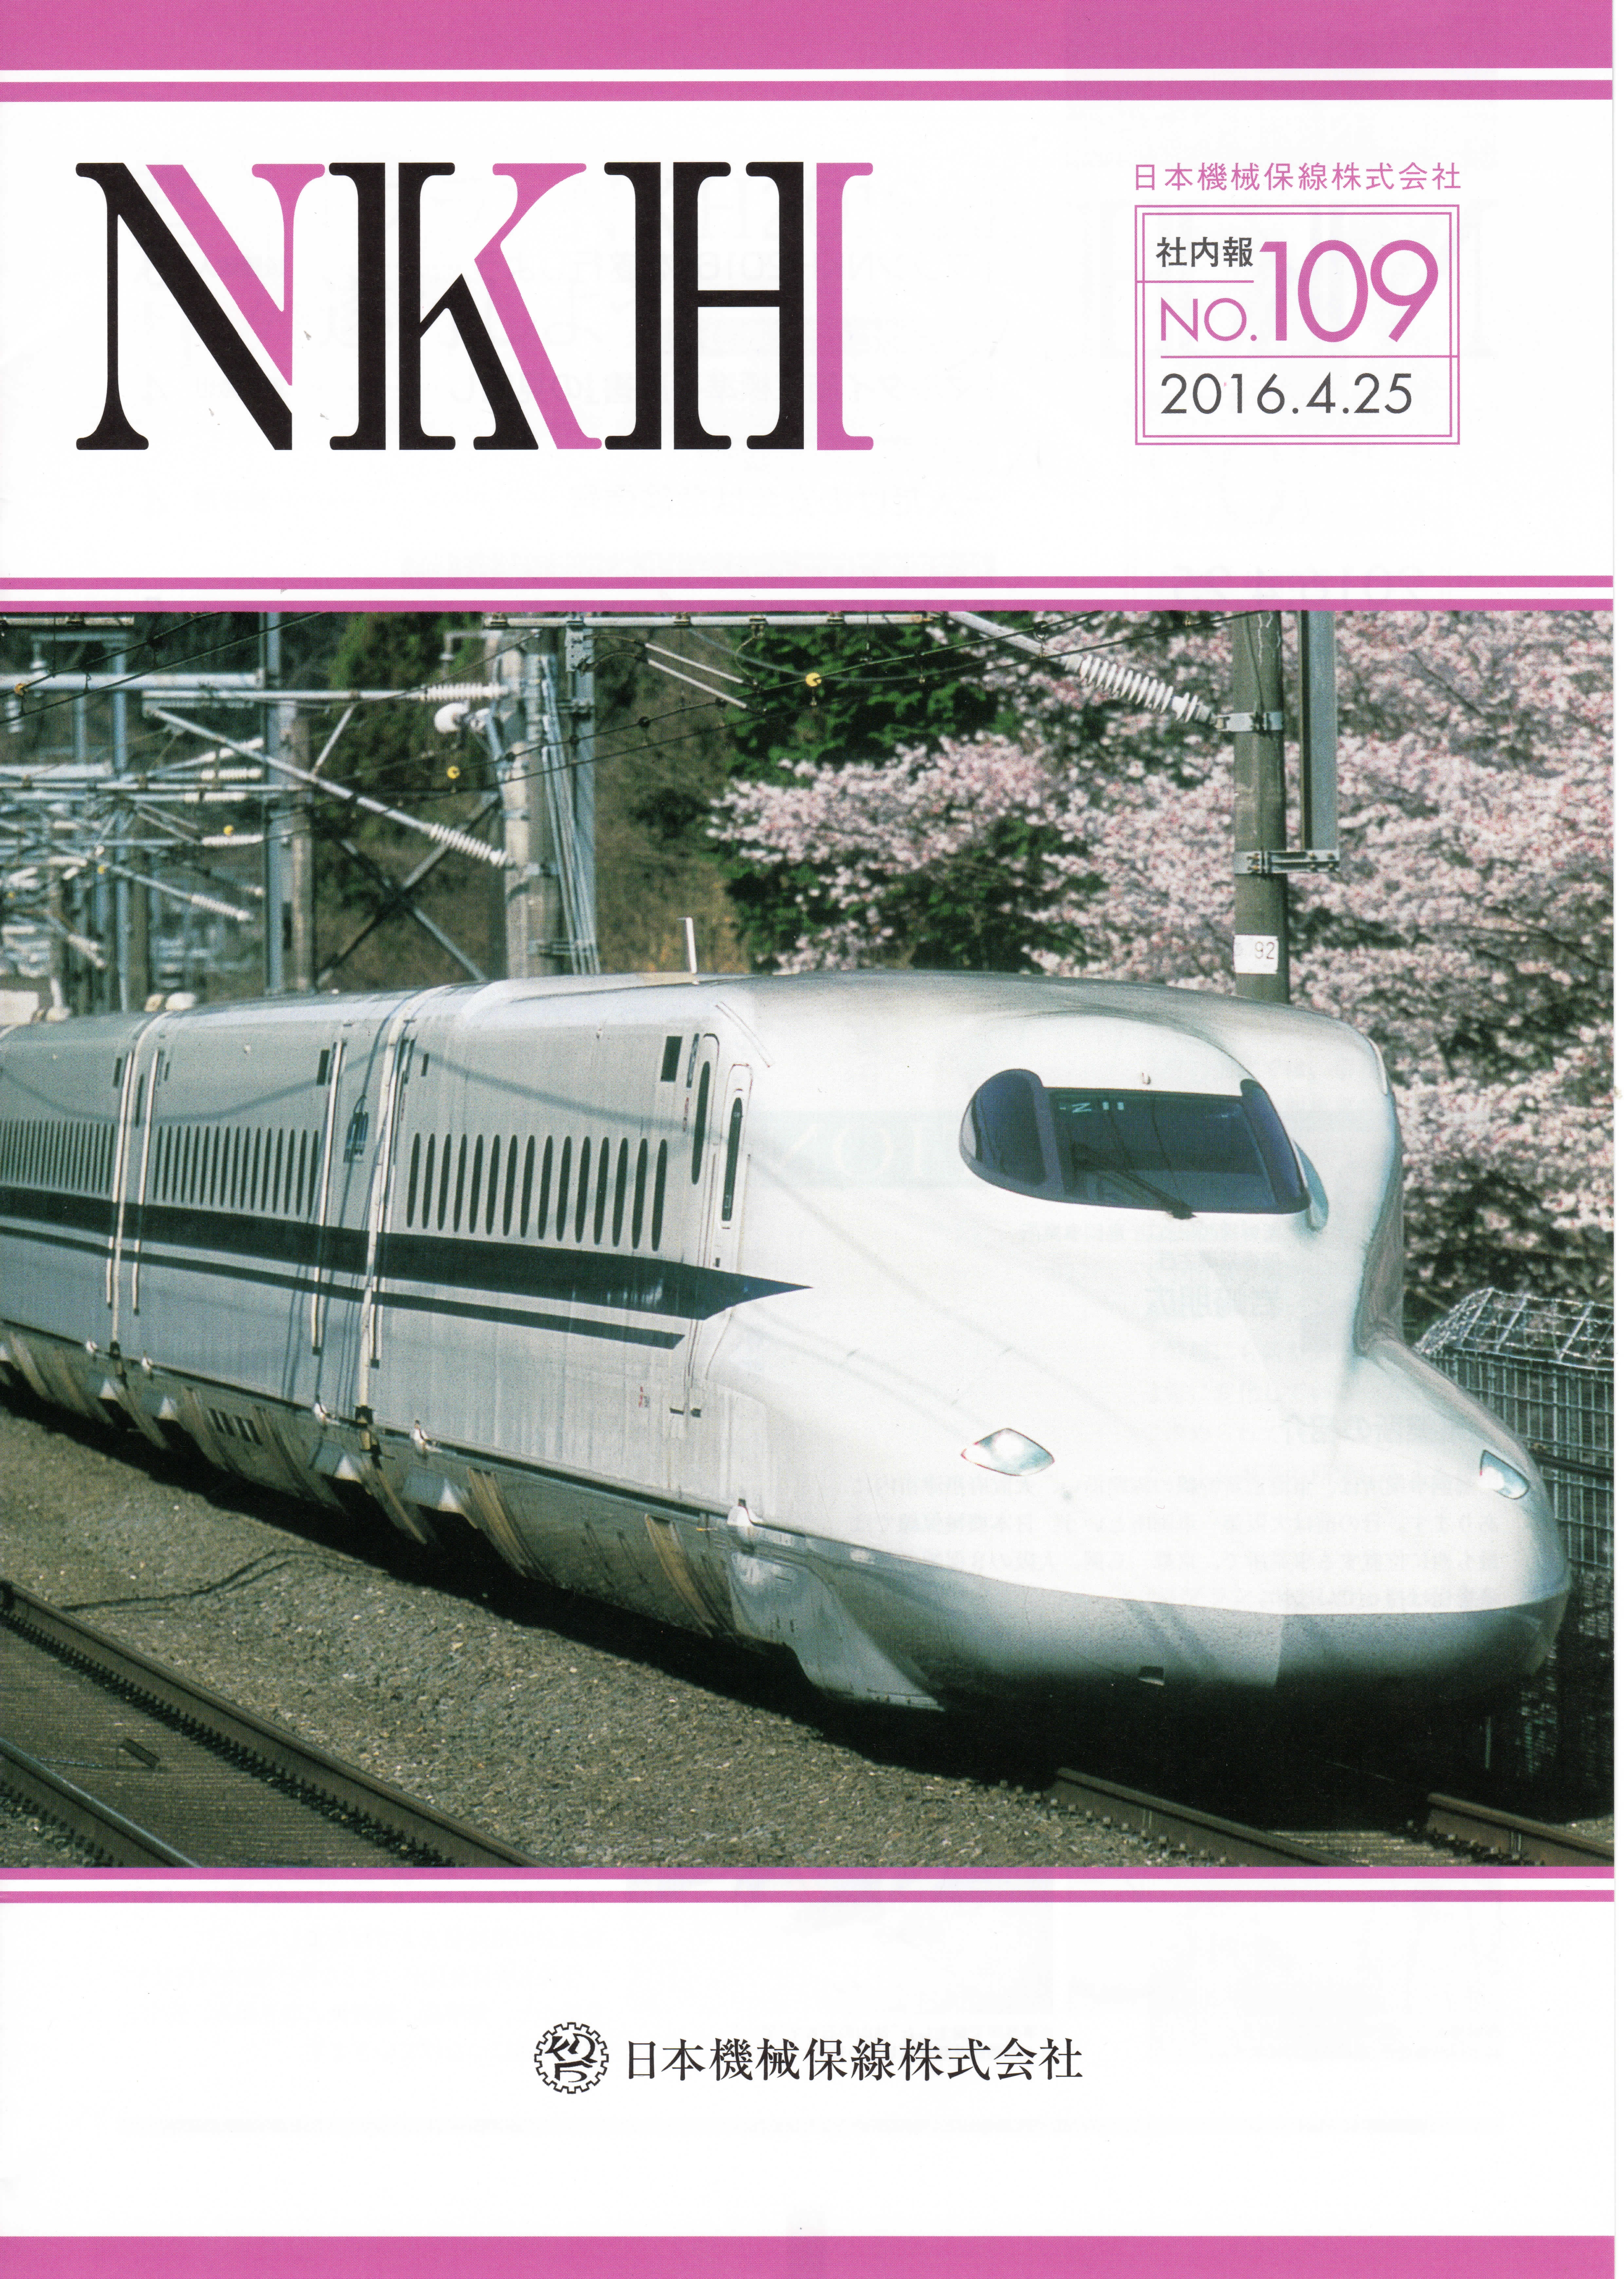 NKH109号.jpg